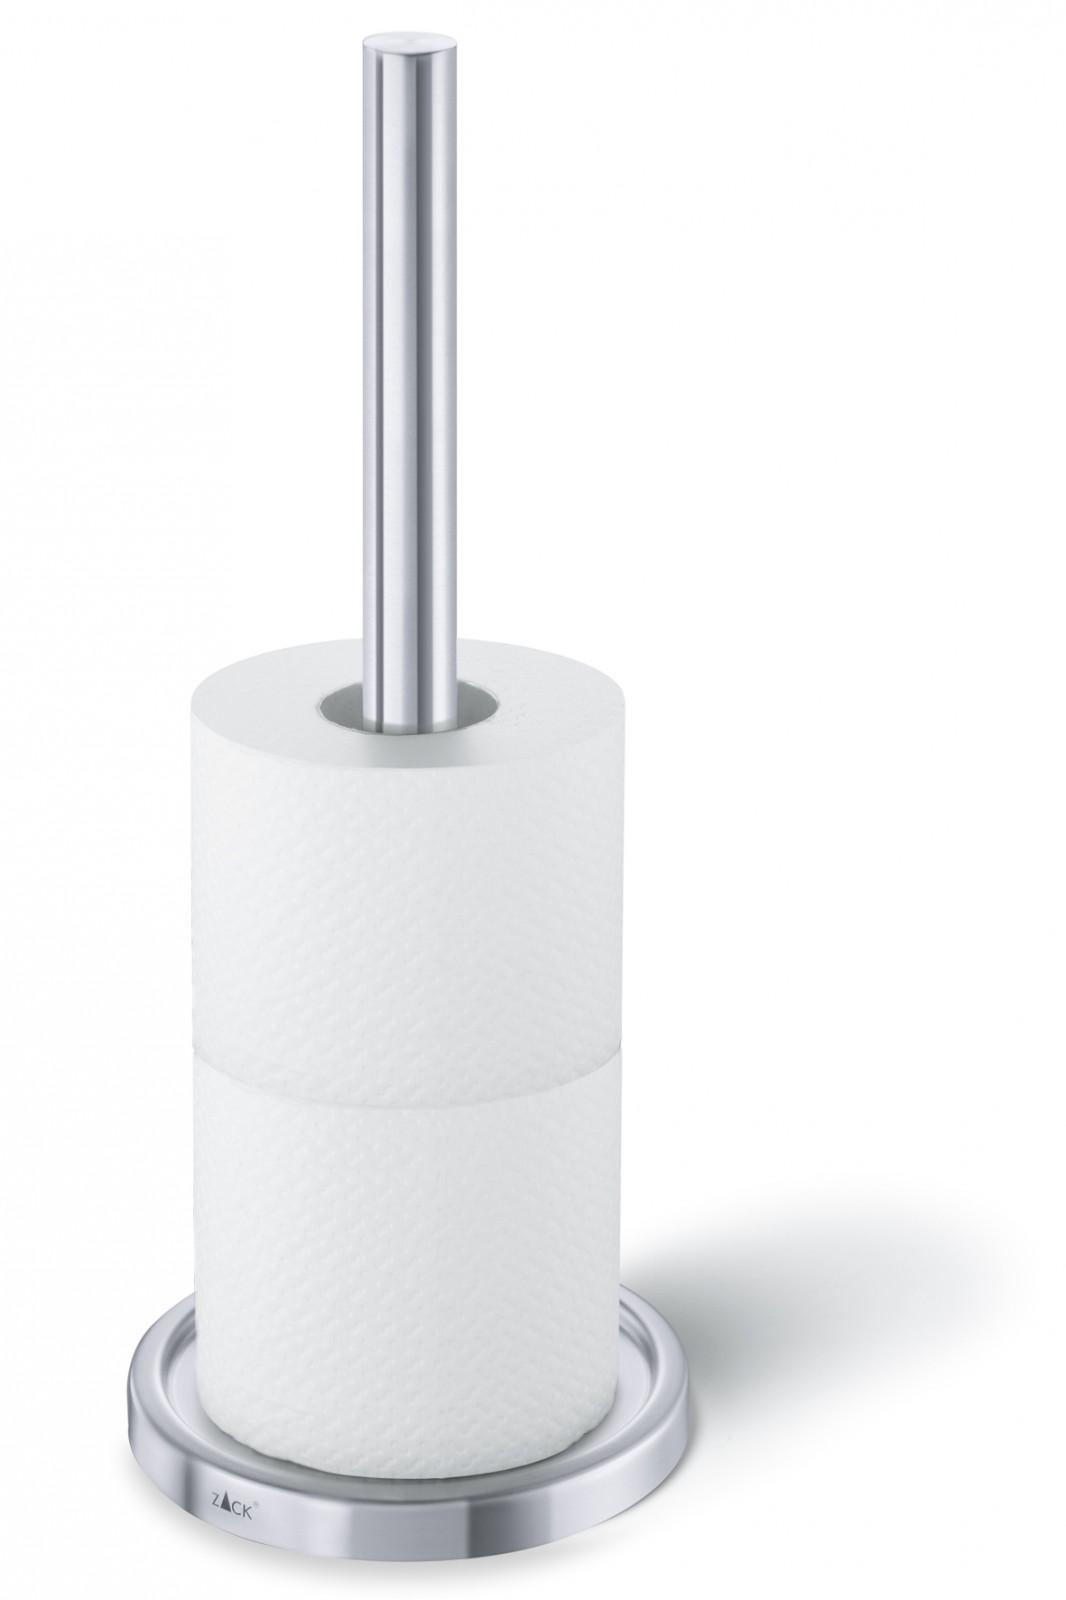 Edelstahl Ersatz Toilettenpapierhalter Wc Bad Zack 40180 Bad Bad